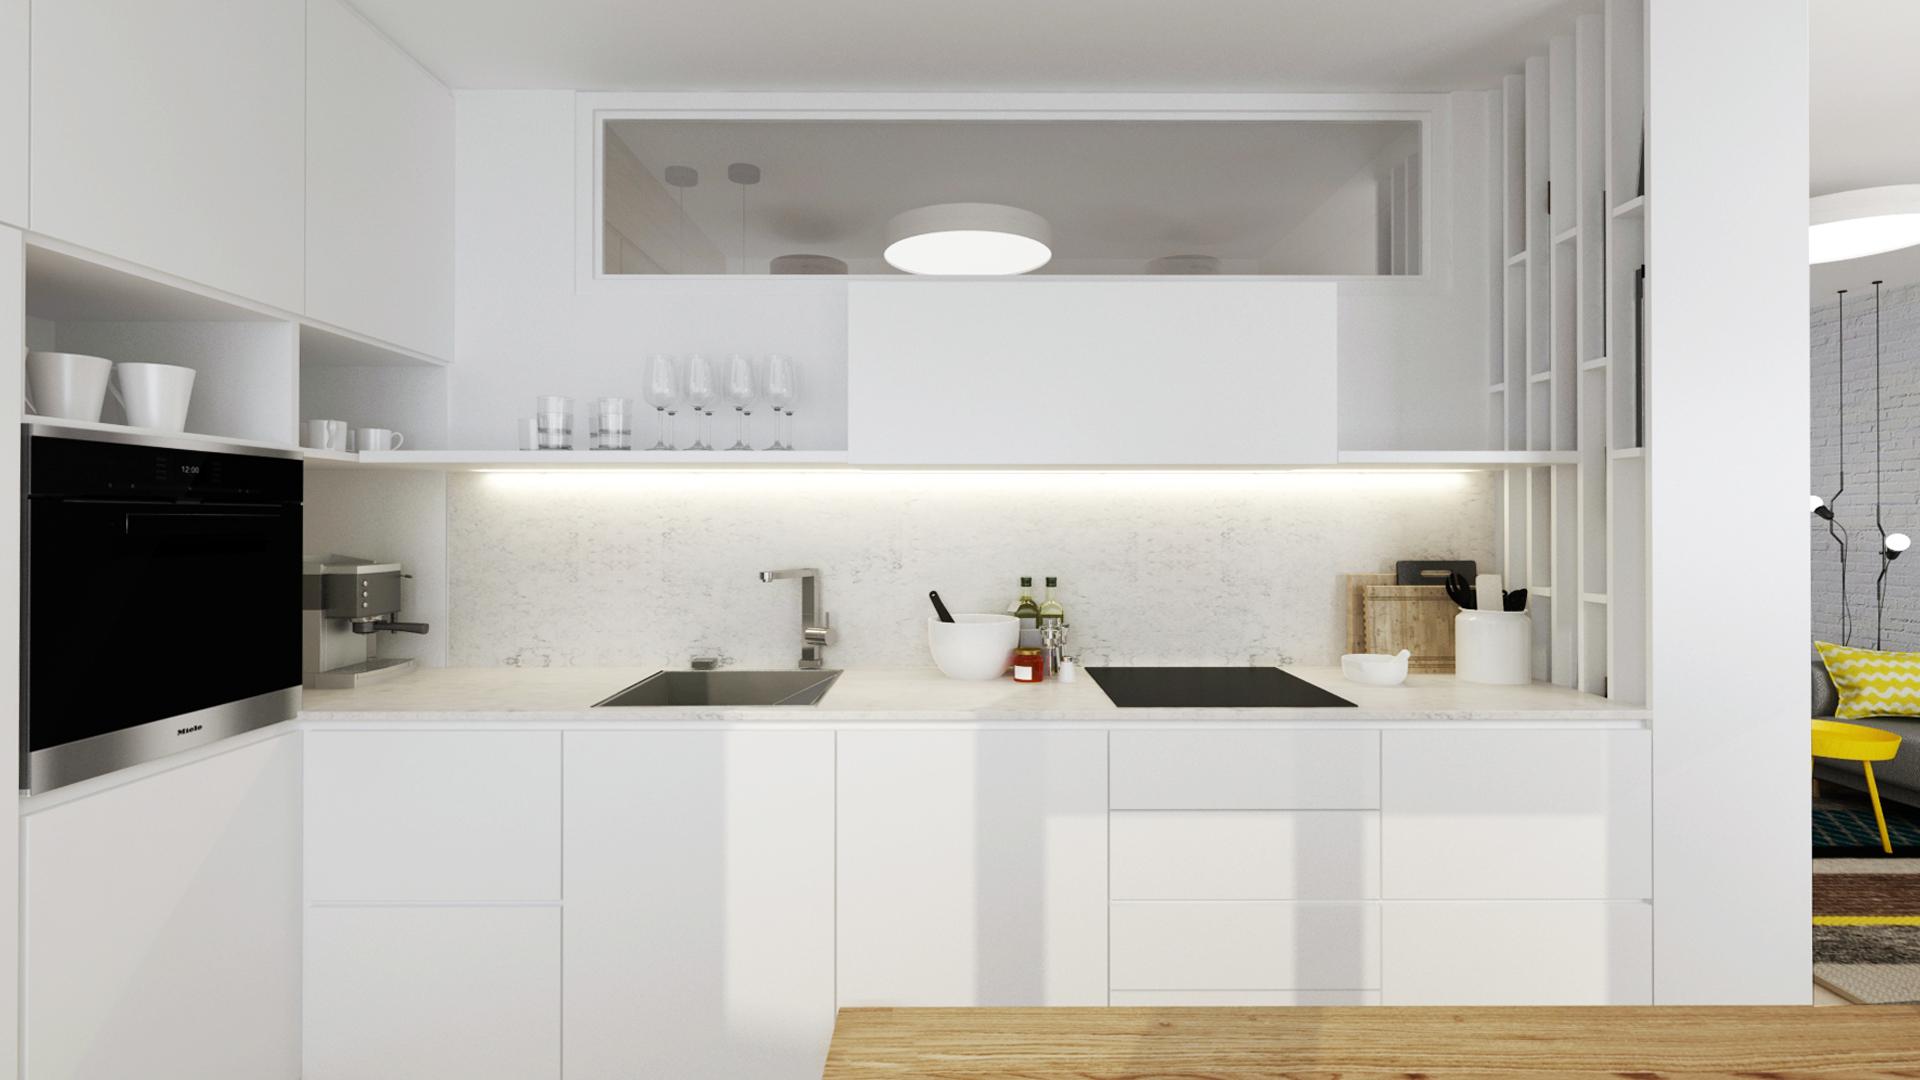 rekonstrukcia bytu, rekonstrukcia bytu bratislava, navrh interieru bytu, navrh interieru jedalne, navrh interieru, navrh kuchyne, navrh interieru kuchyne, barove sedenie, interierovy dizajn, interierovy dizajner, interior design, interior designer, veronika paluchova, flat design, reconstruction bratislava, dub, prirodny dub, white flat, white kitchen